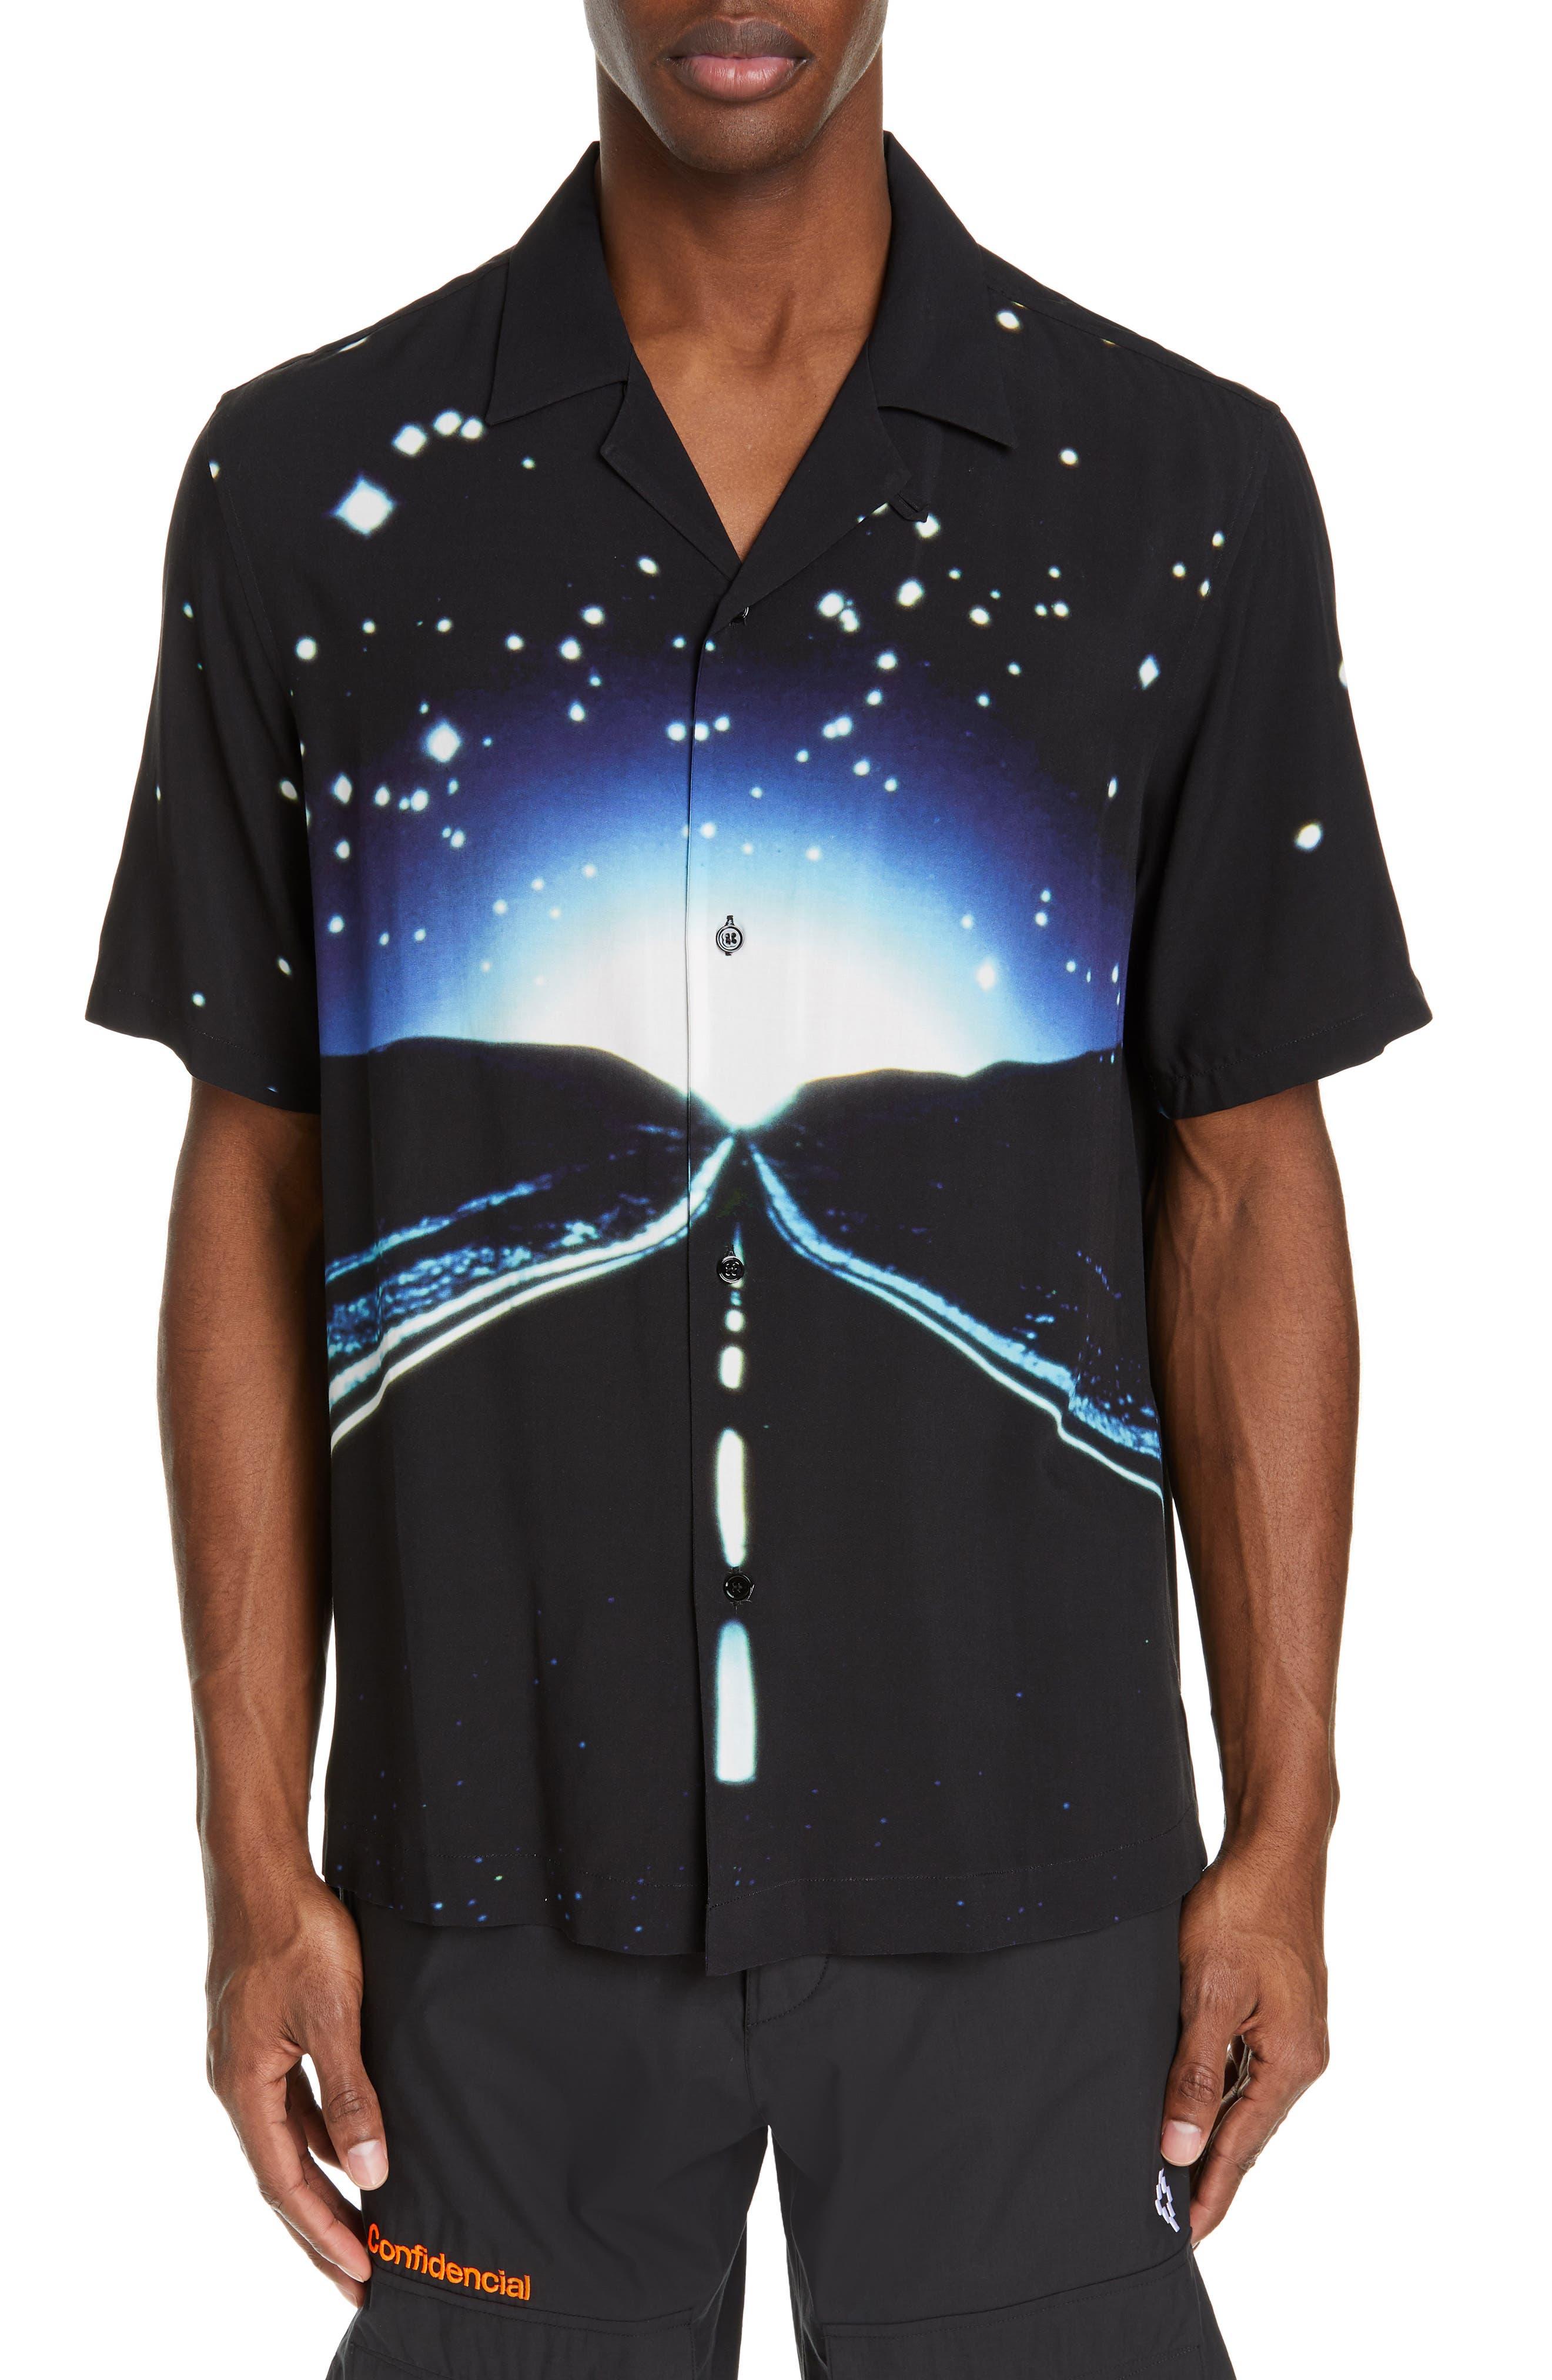 Mad max mel gibson blanc homme custom made t-shirt